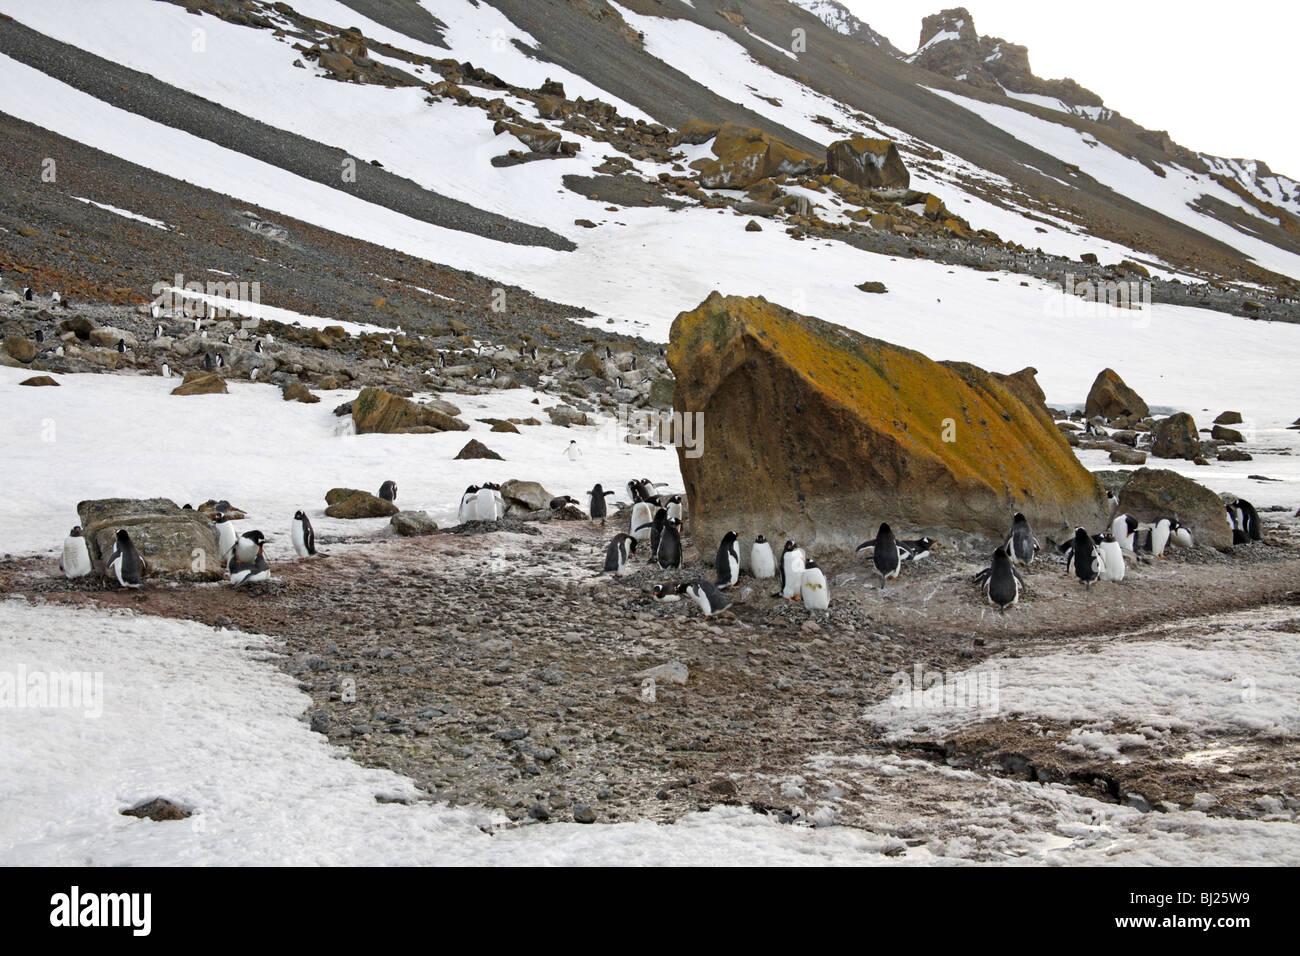 Gentoo Penguin Pygoscelis papua colony at Brown Bluff, Antarctic peninsula - Stock Image